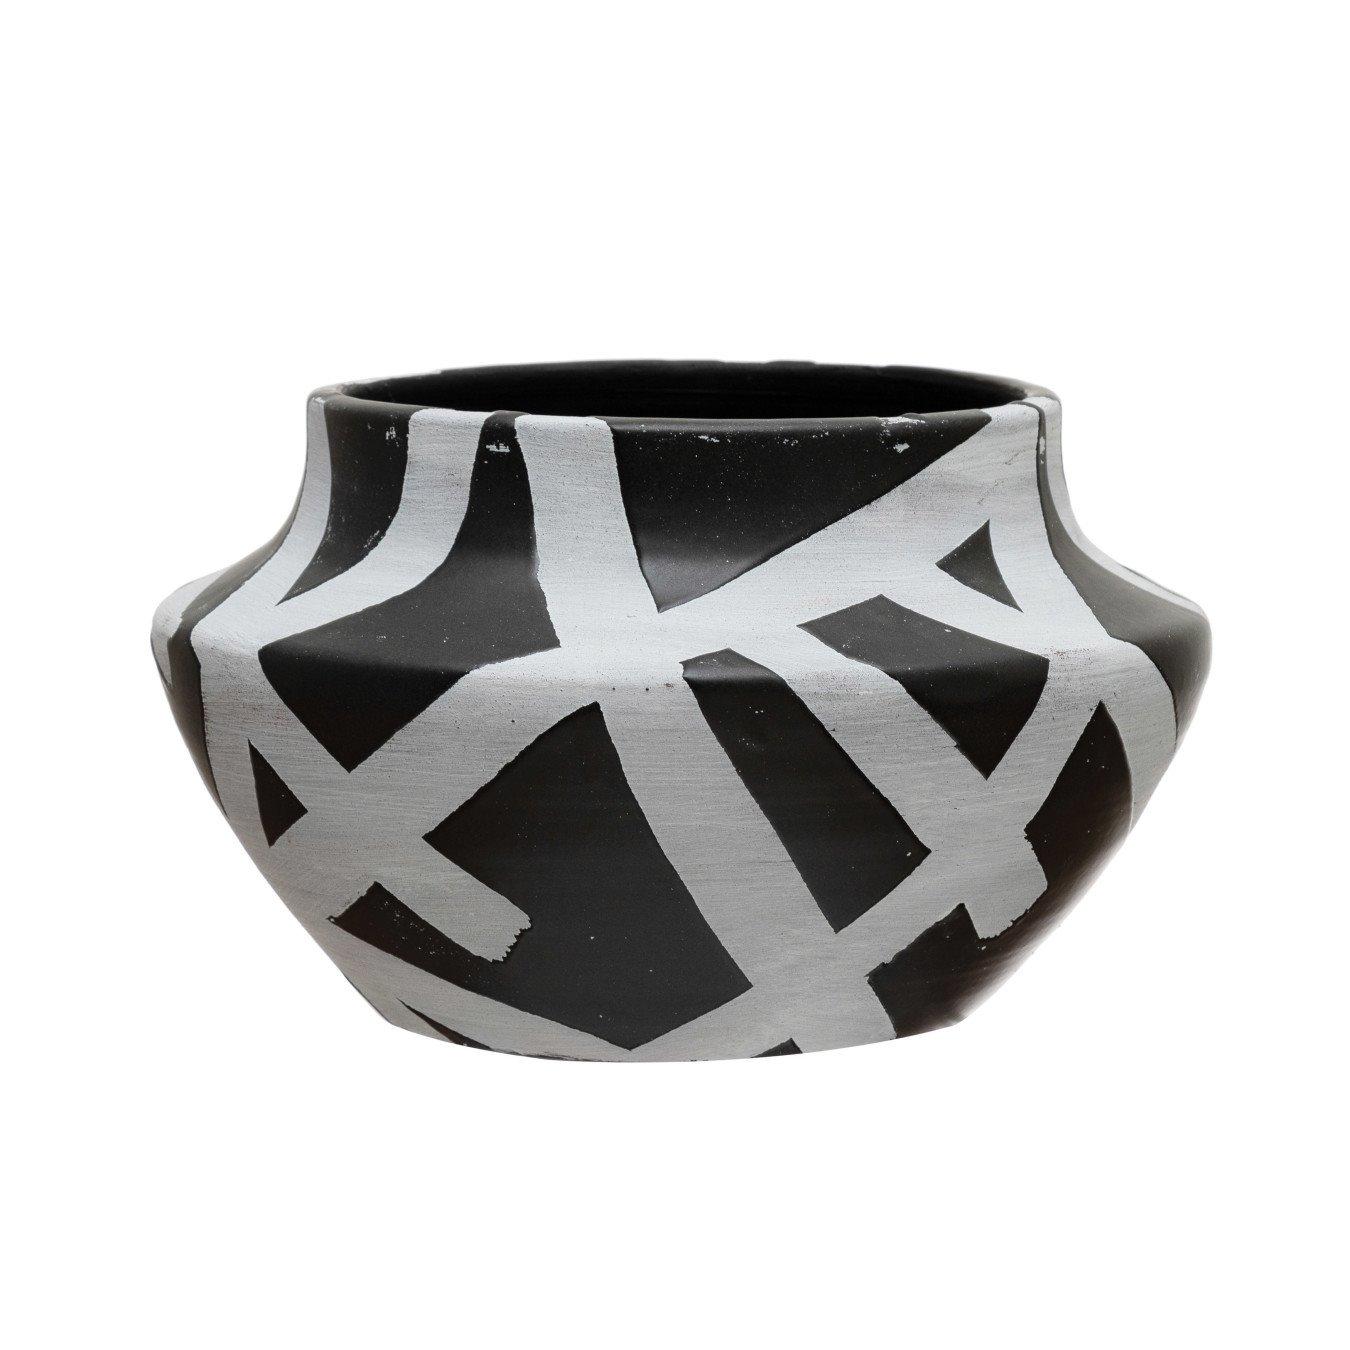 "Terra-cotta Planter with Design, Black & White (Holds 5"" Pot)"